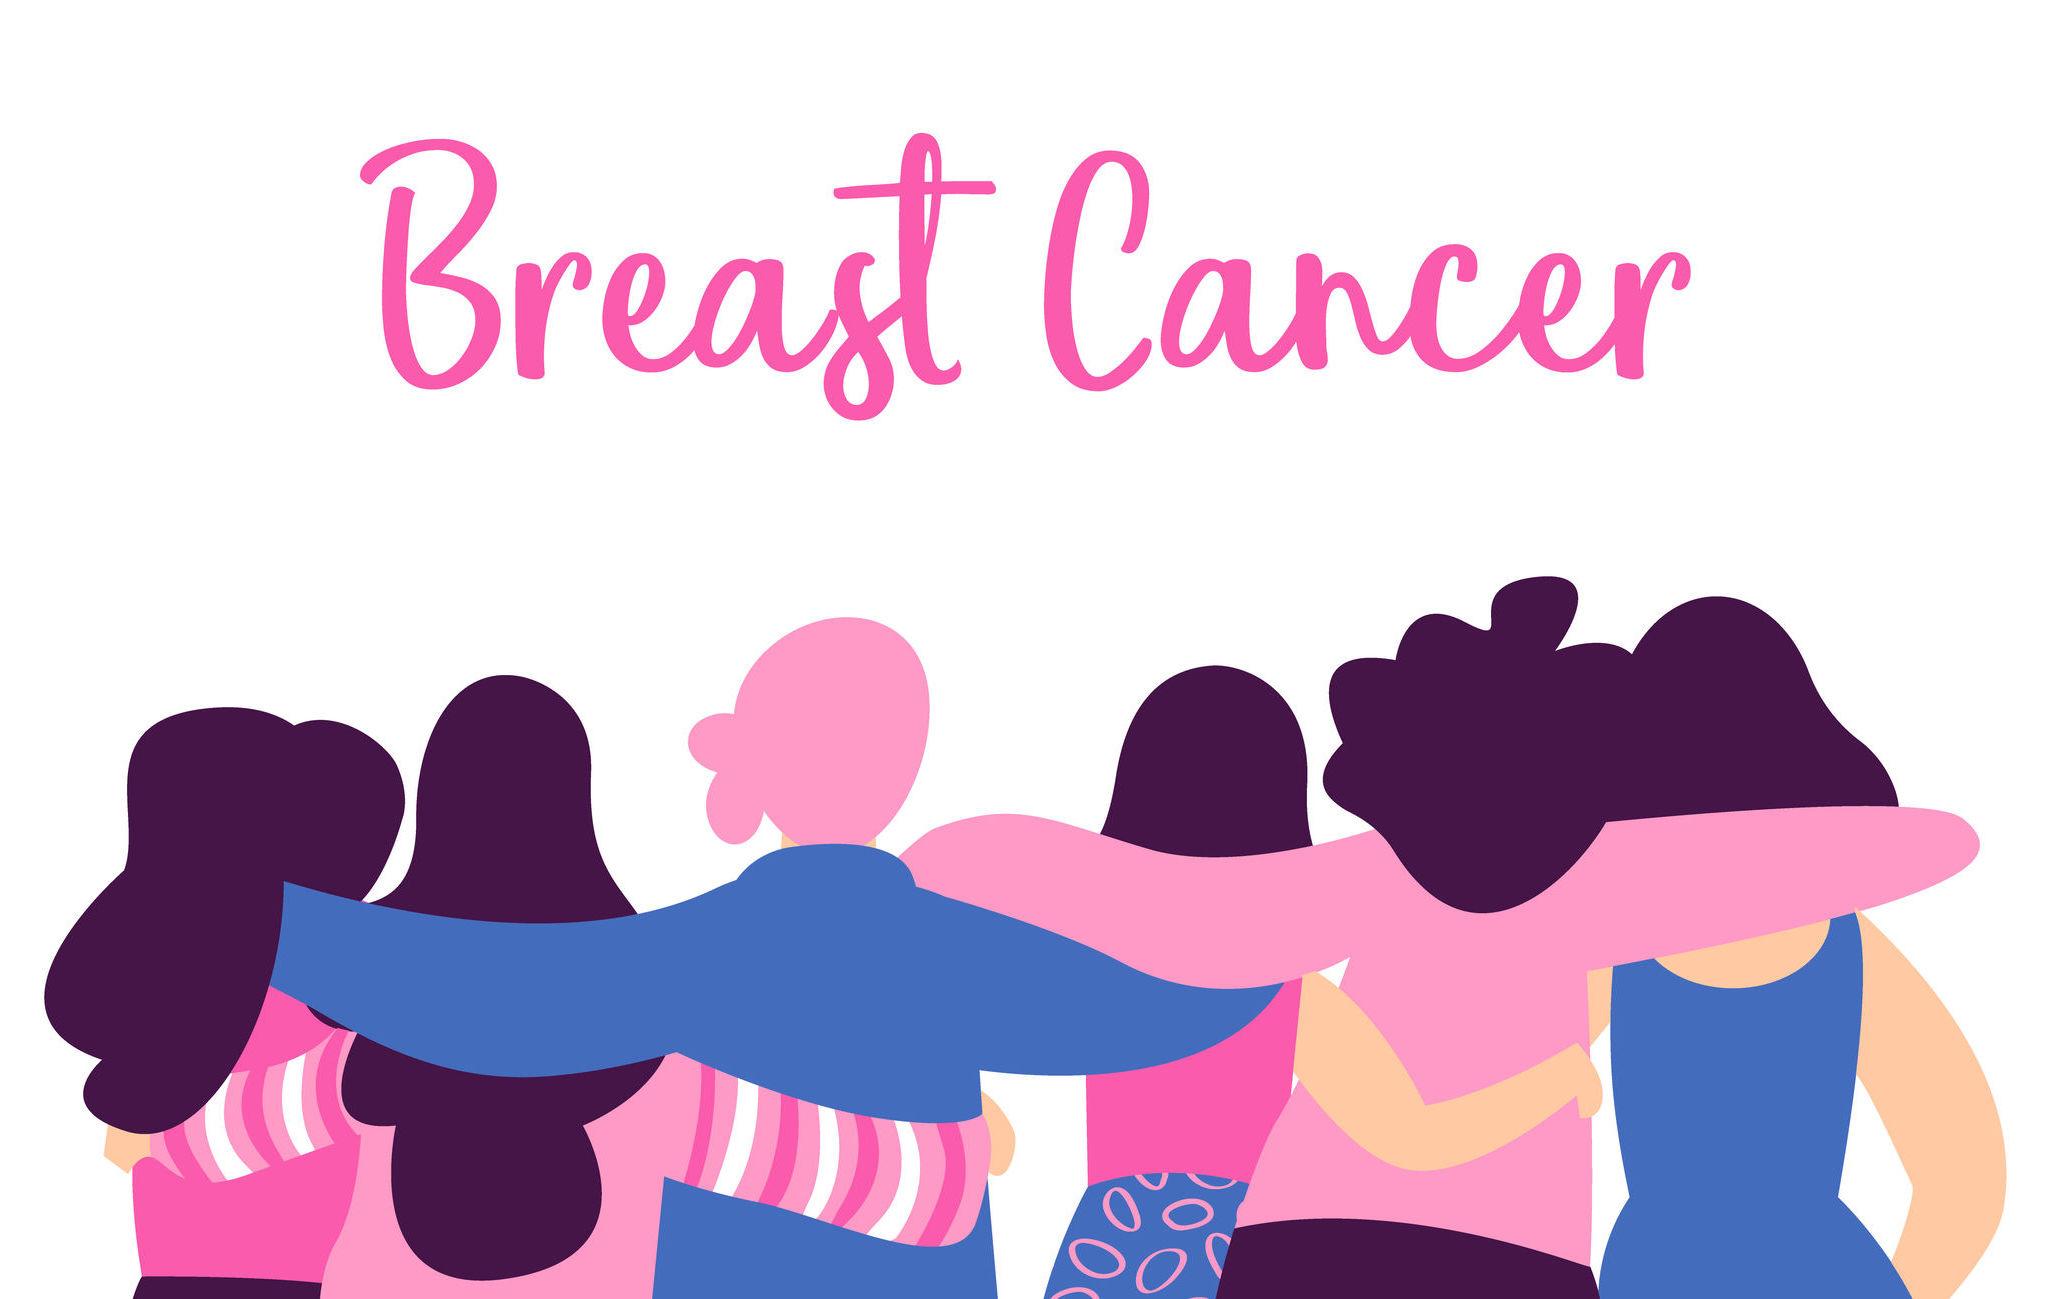 HER2 乳癌治療更便利!美 FDA 核准 Phesgo 皮下注射